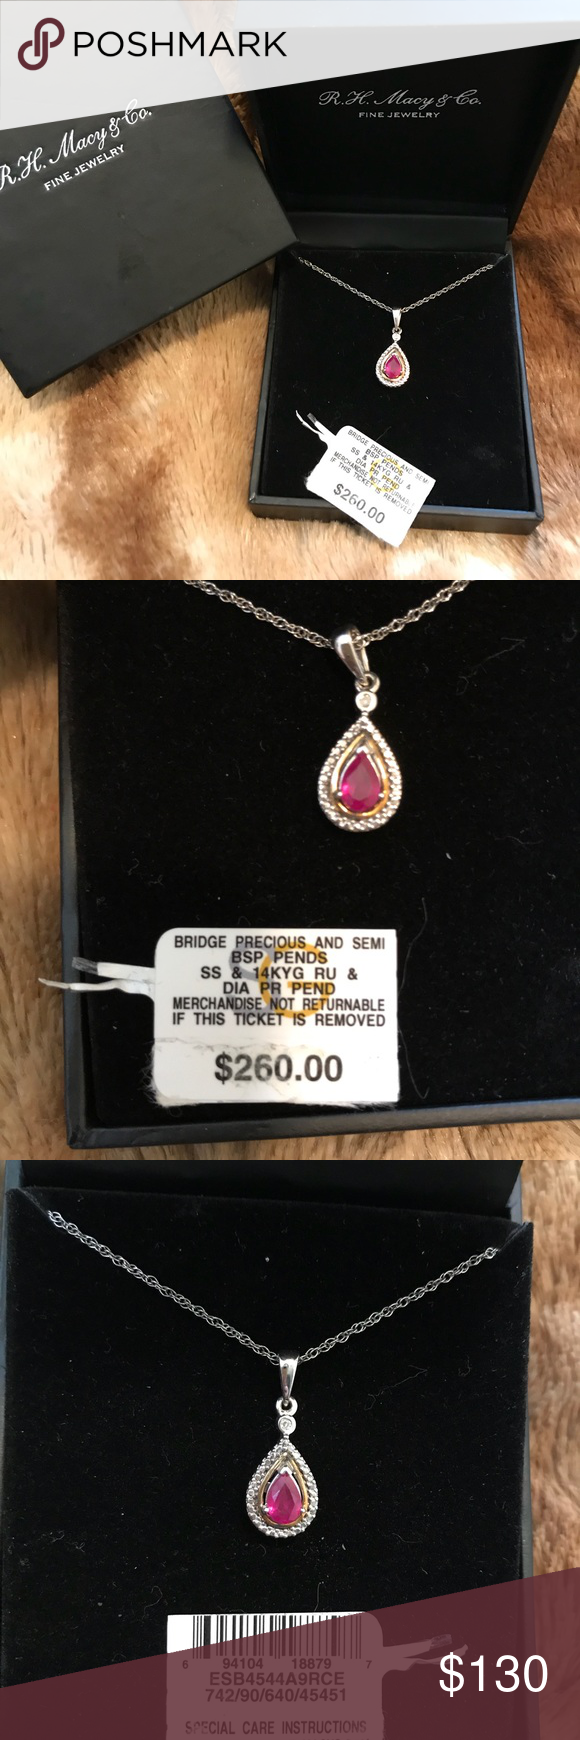 34++ Macys fine jewelry phone number ideas